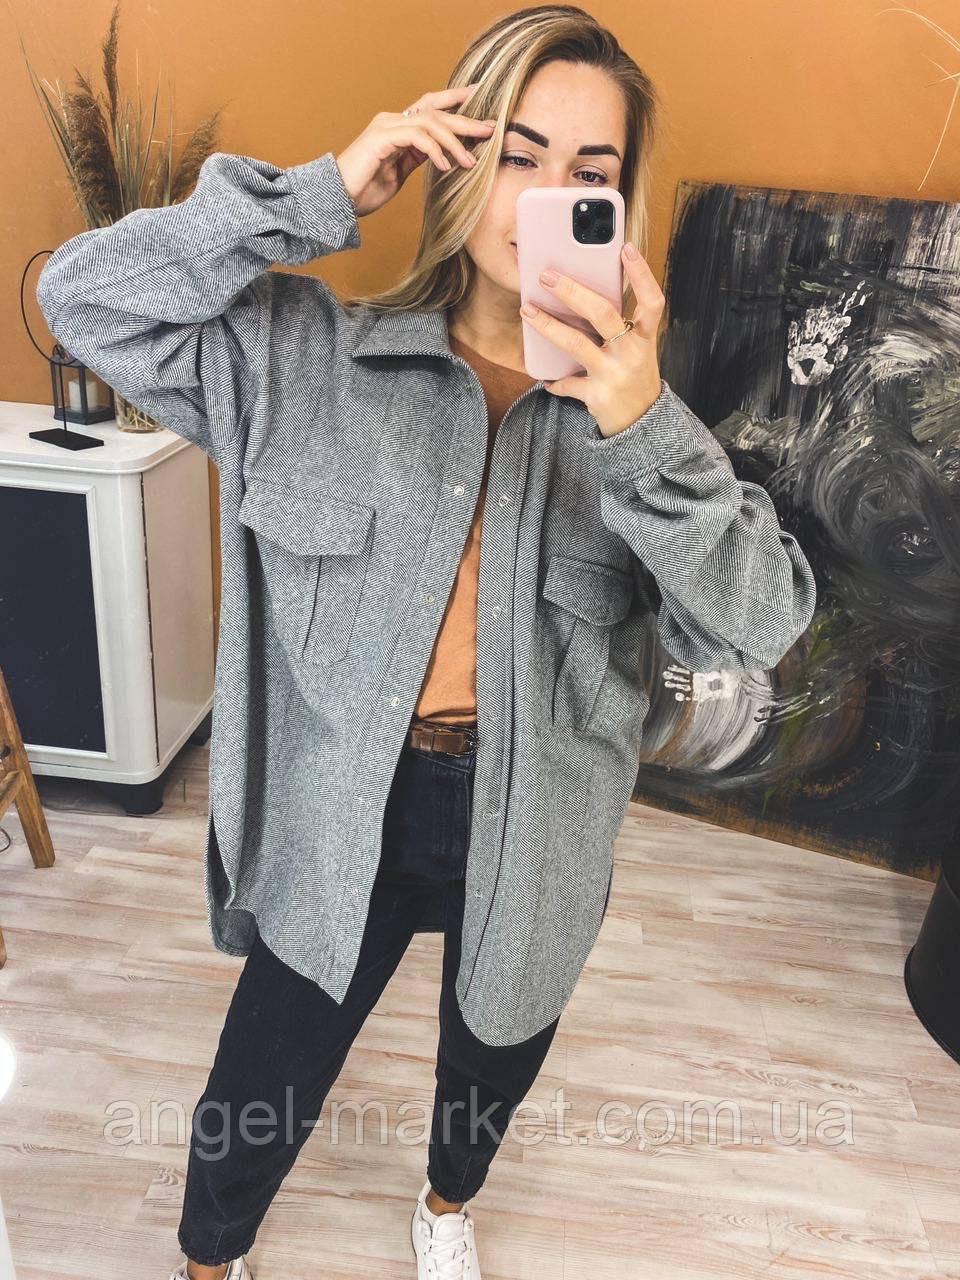 Жіноча модна сорочка - кардиган тепла Новинка 2020